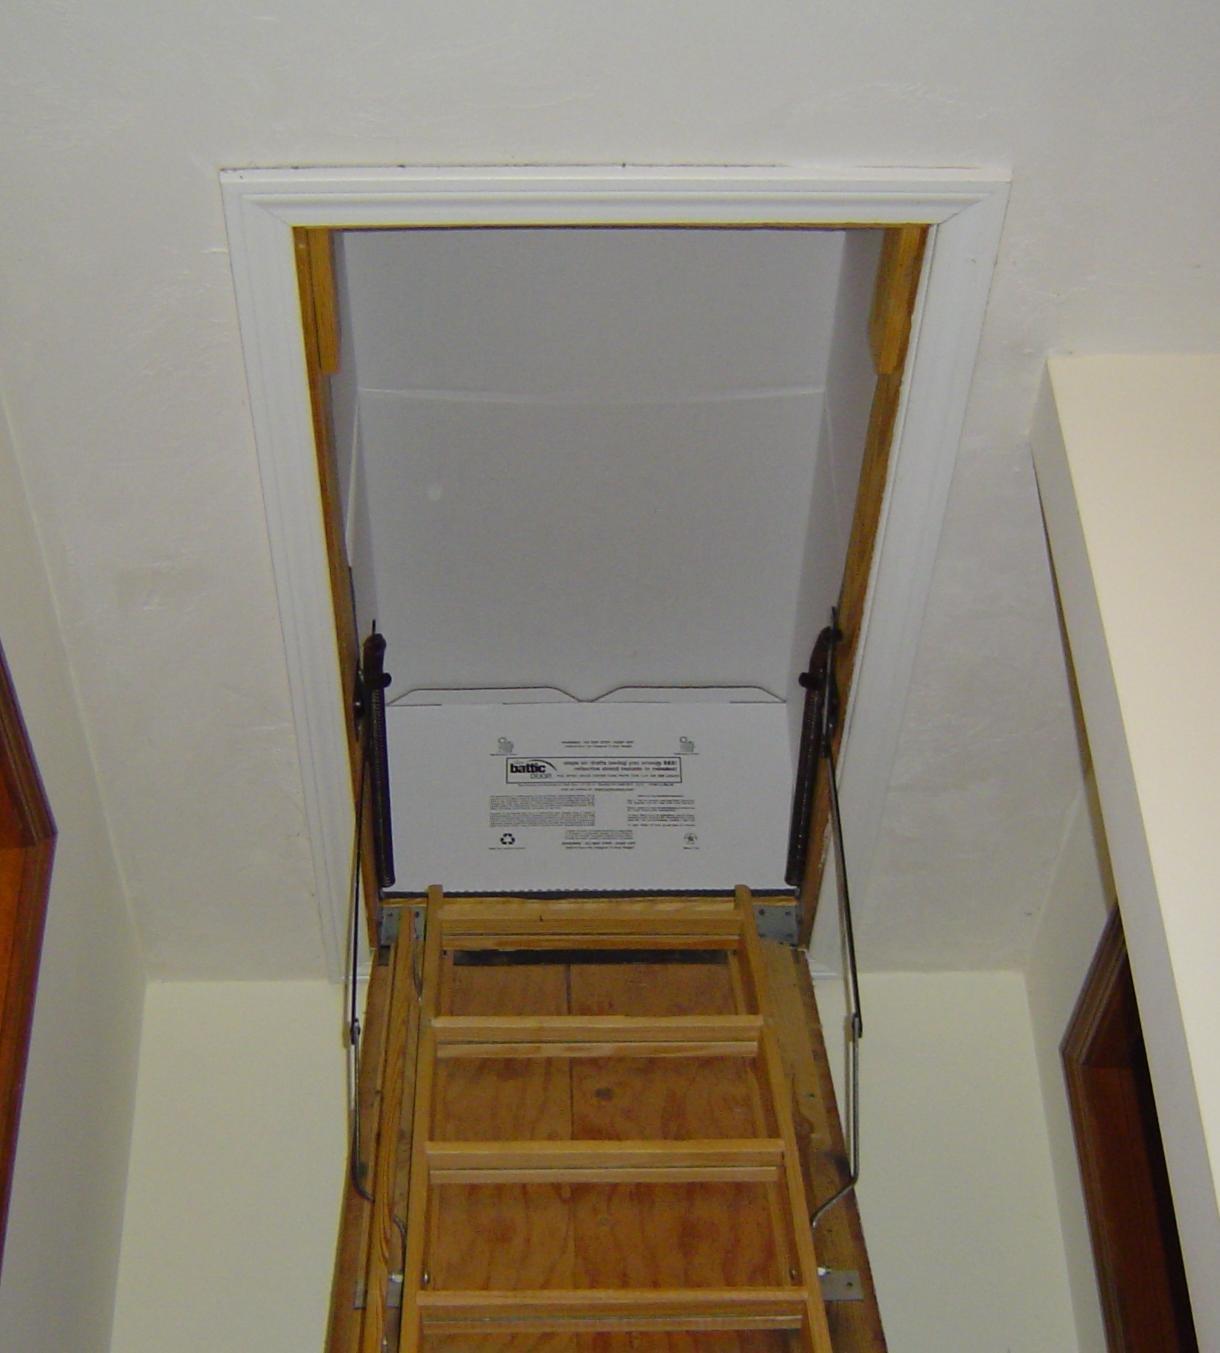 r 50 22 in x 54 in attic stair cover amazon com